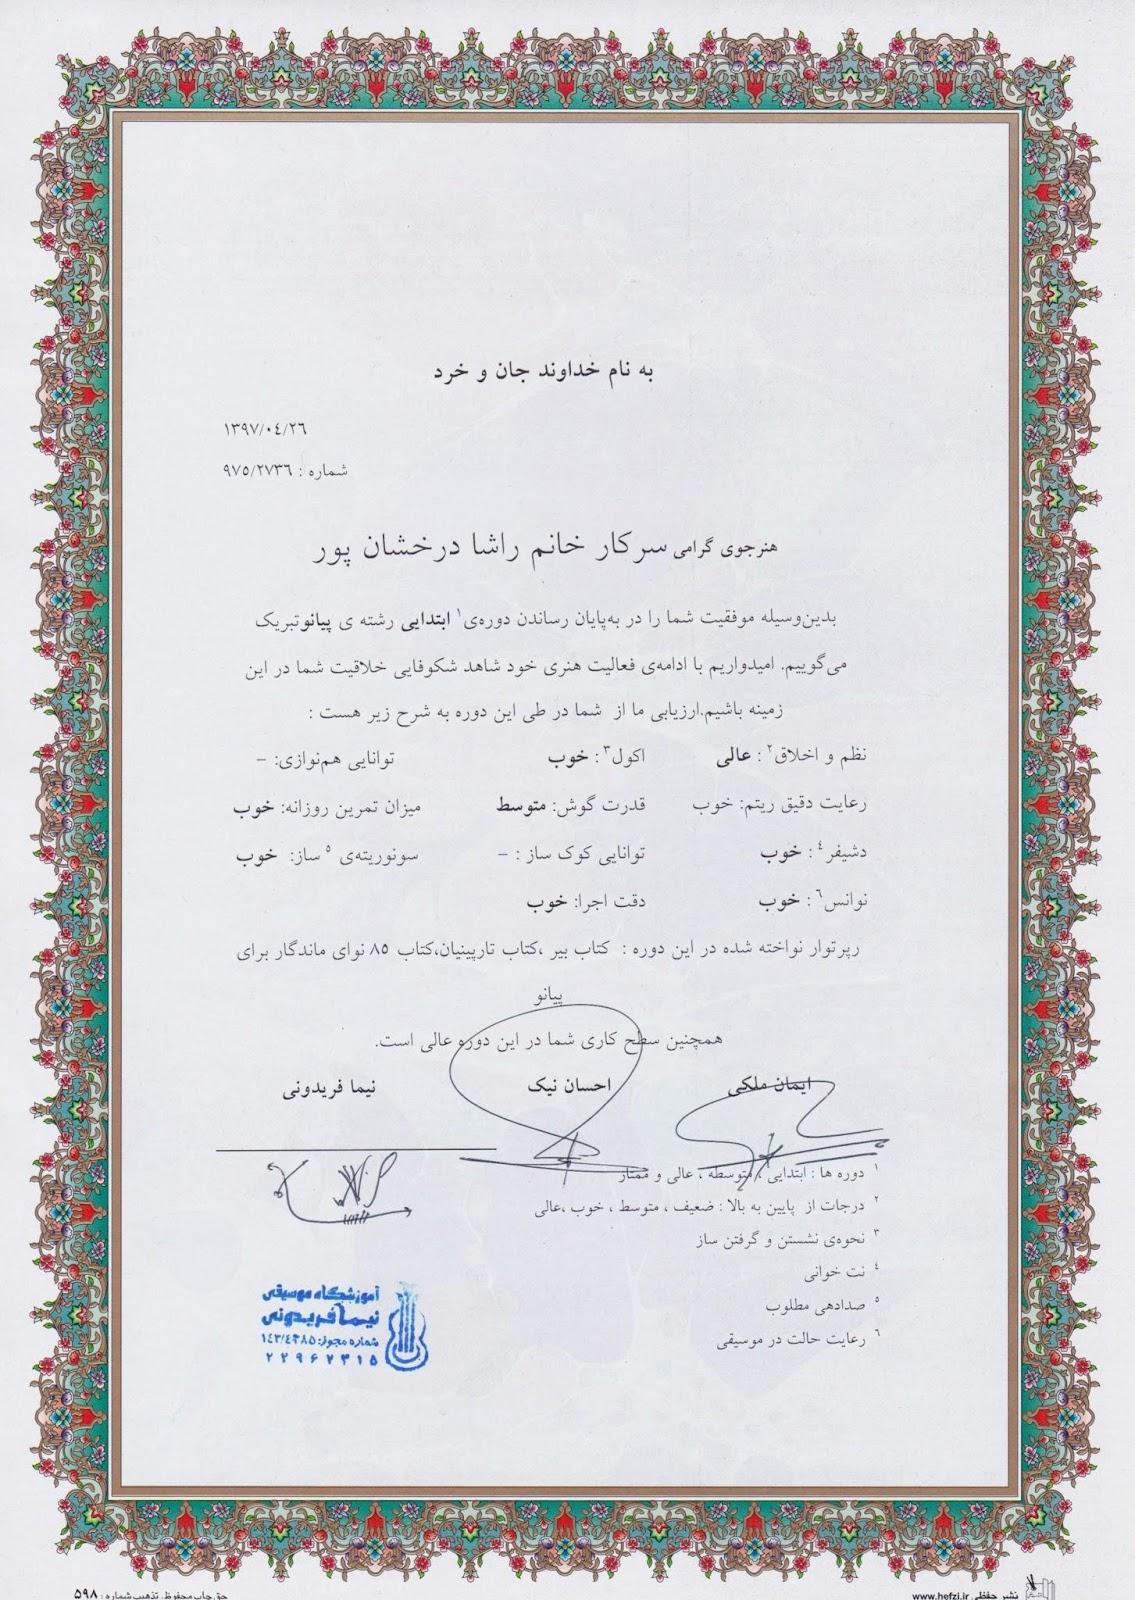 گواهینامهی پایاندورهی ابتدایی پیانو راشا درخشانپور هنرجوی احسان نیک